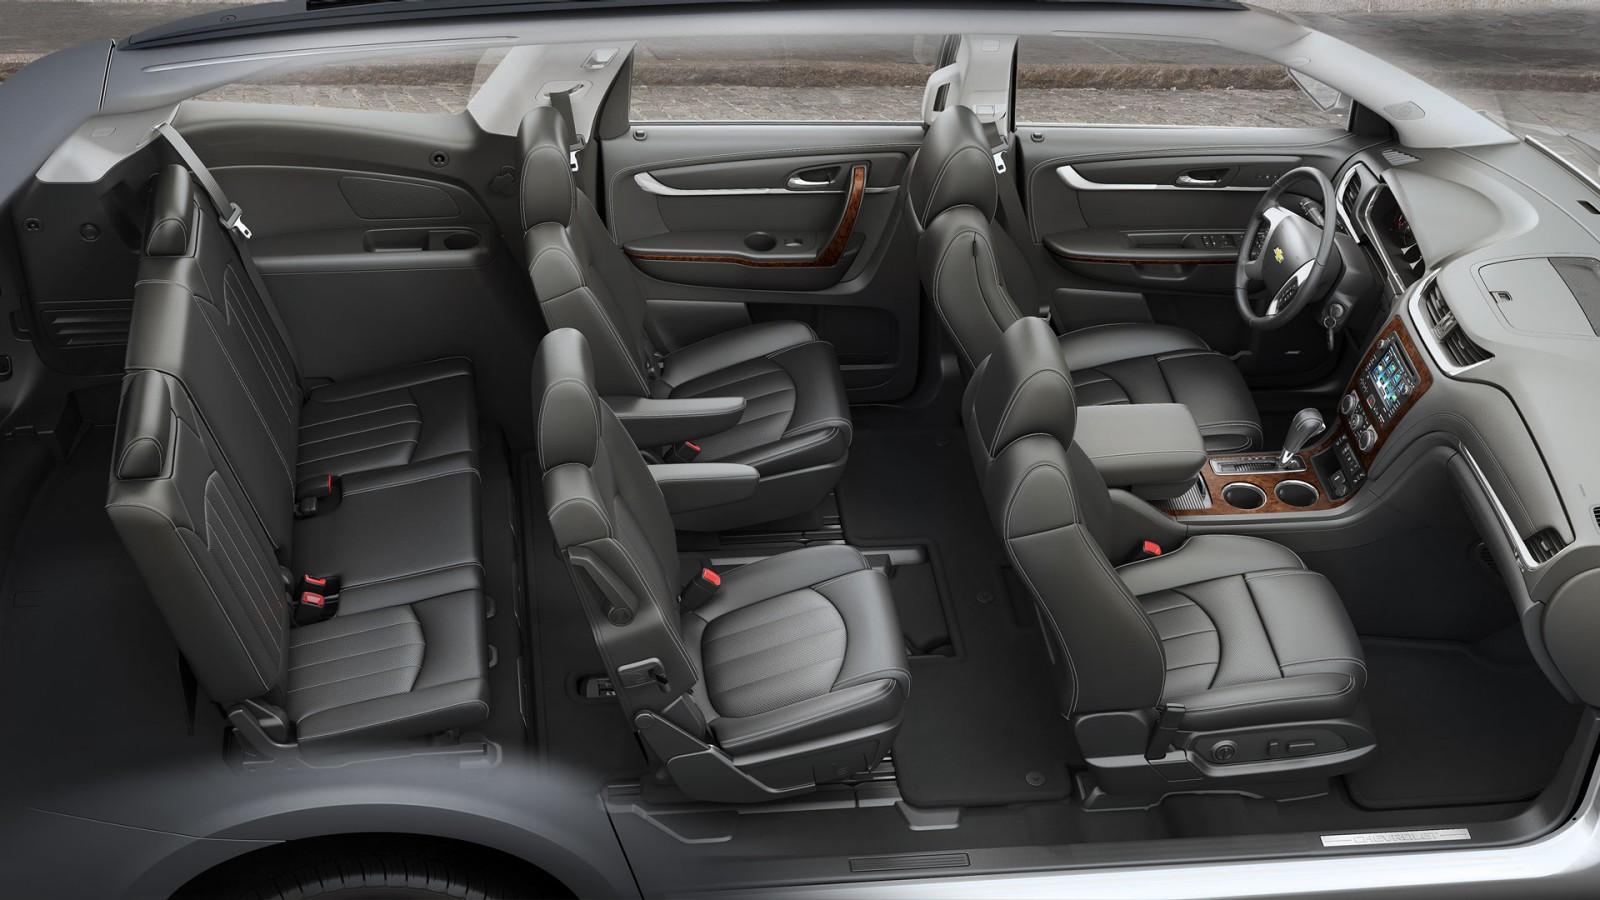 All Chevy chevy 2015 suv : 2015 Chevrolet Traverse